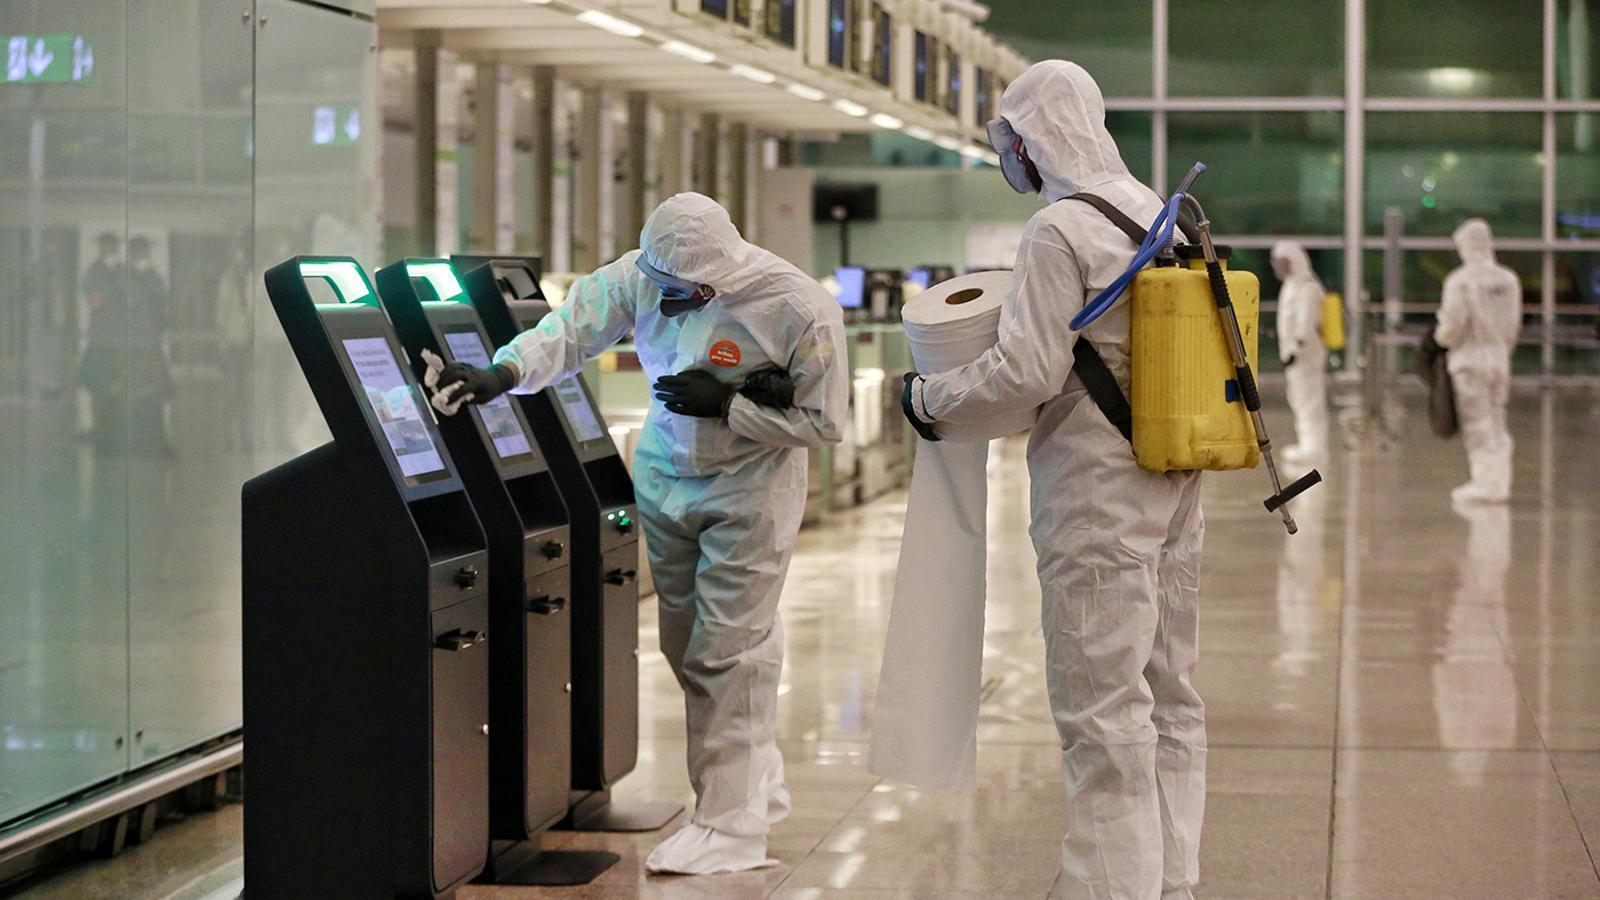 A l'aeroport del Prat li costa remuntar